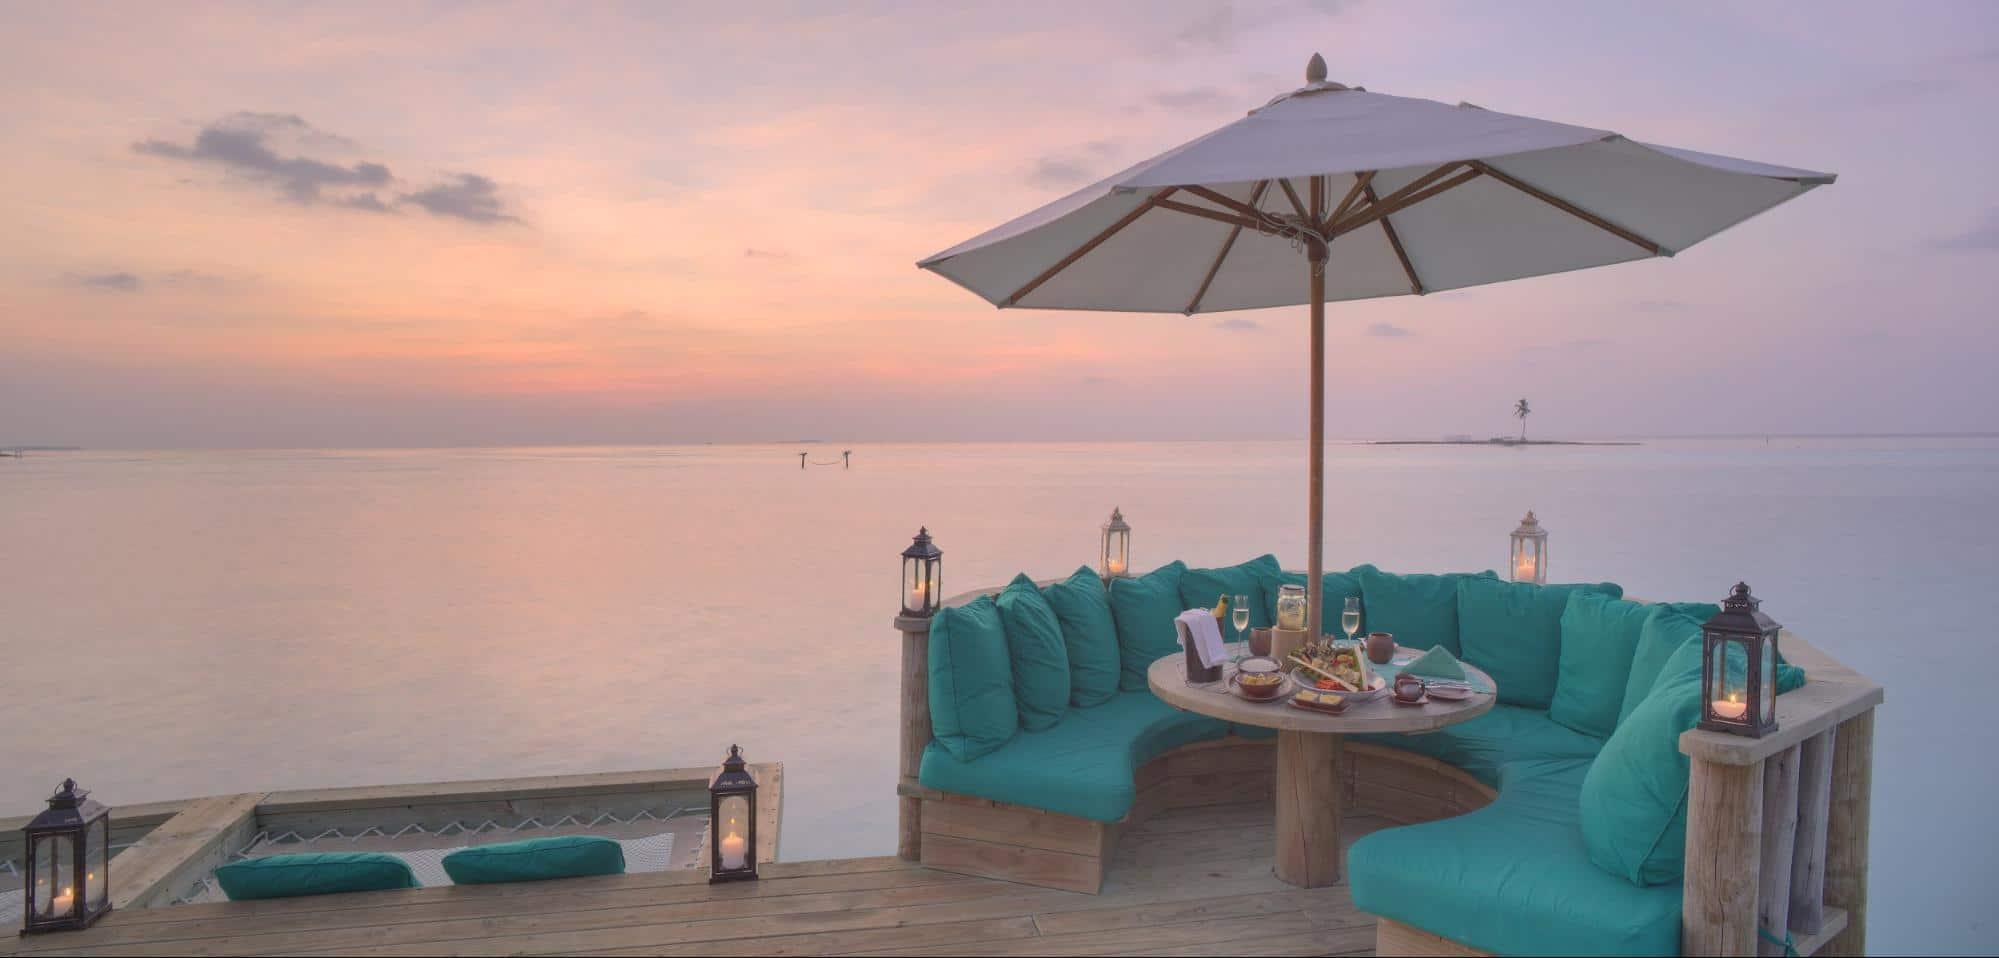 Sunset at the Overwater Bar jetty - Courtesy of Gili Lankanfushi